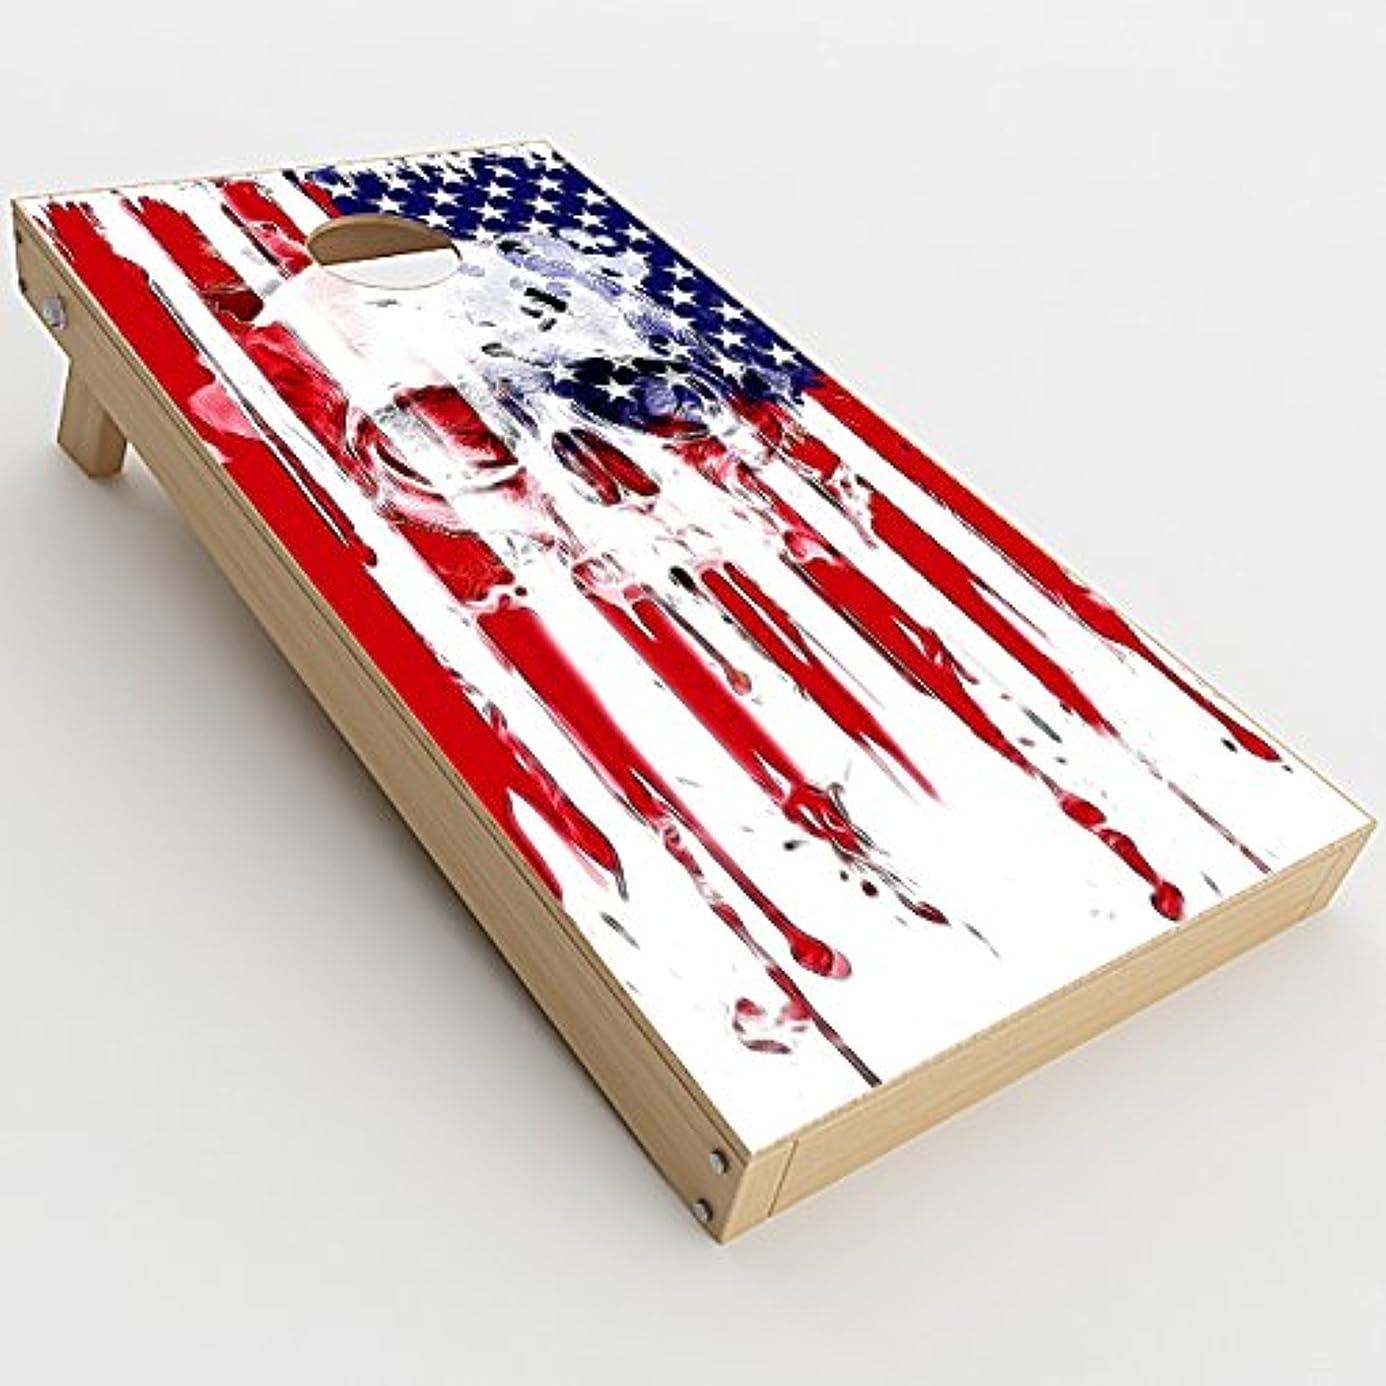 Skin Decals Vinyl Wrap for Cornhole Game Board Bag Toss (2xpcs.)/U.S.A. Flag Skull Drip